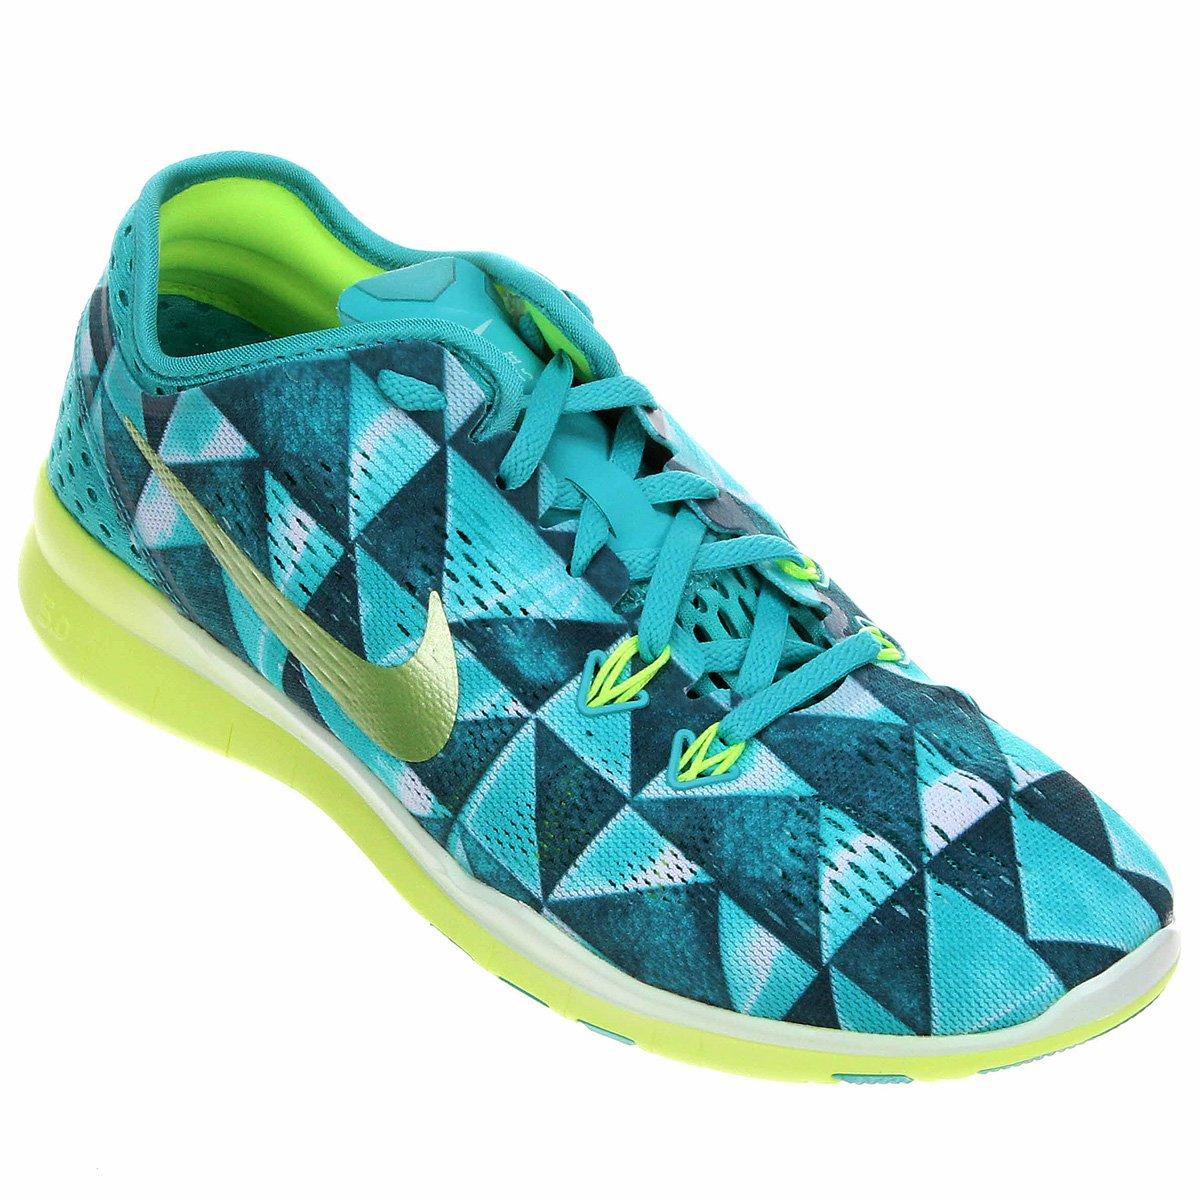 ... coupon code for tênis nike free 5.0 tr fit 5 feminino verde água 17469  1b58b ee75bf0149f6c